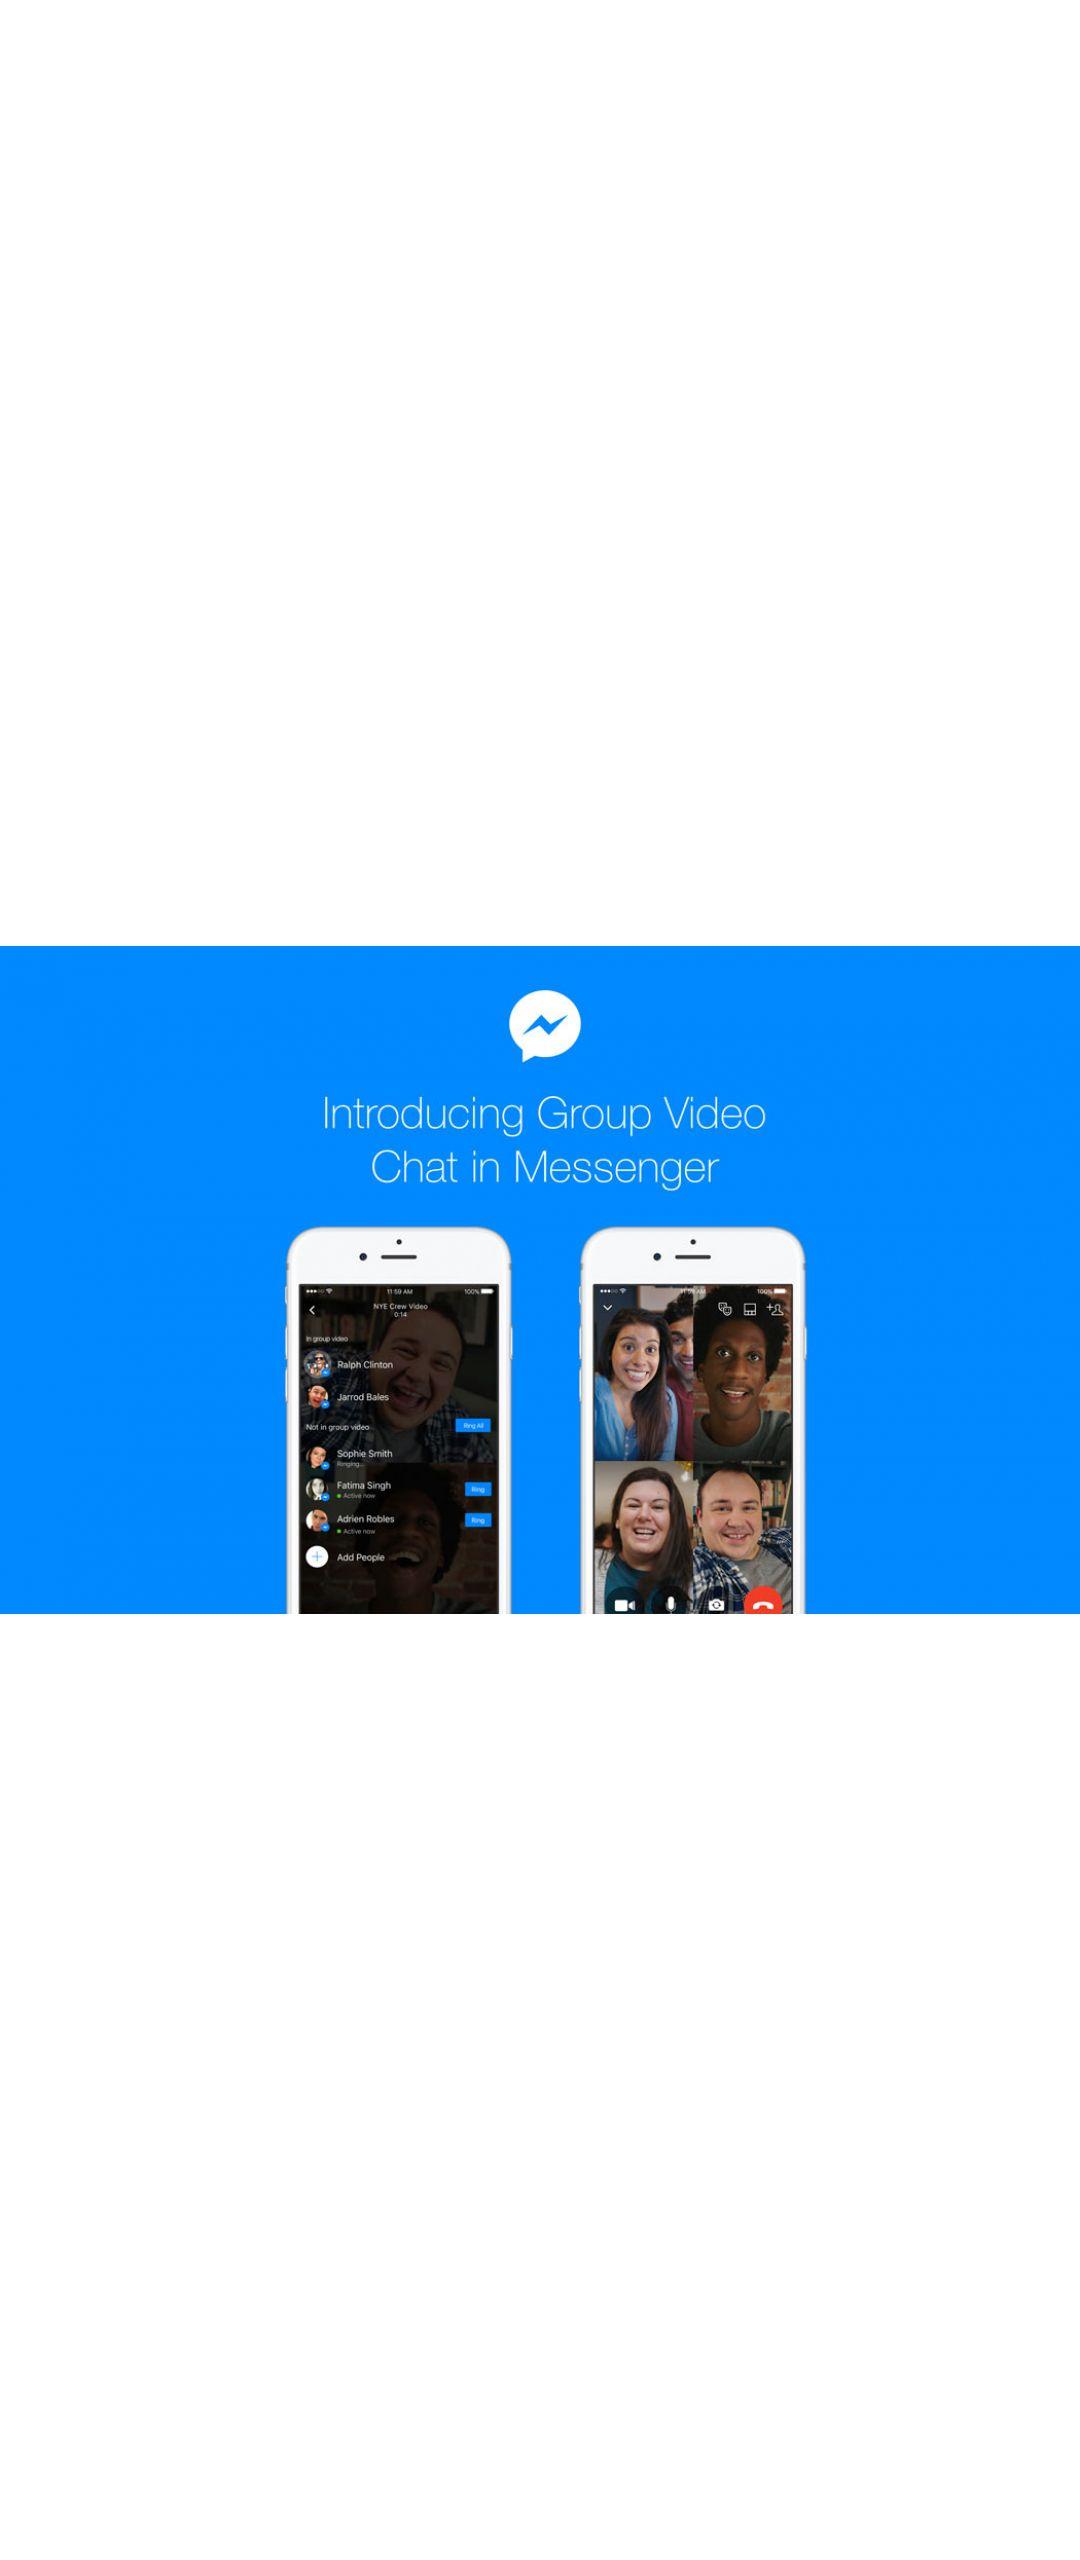 Facebook Messenger se actualiza para videollamar con hasta 50 personas